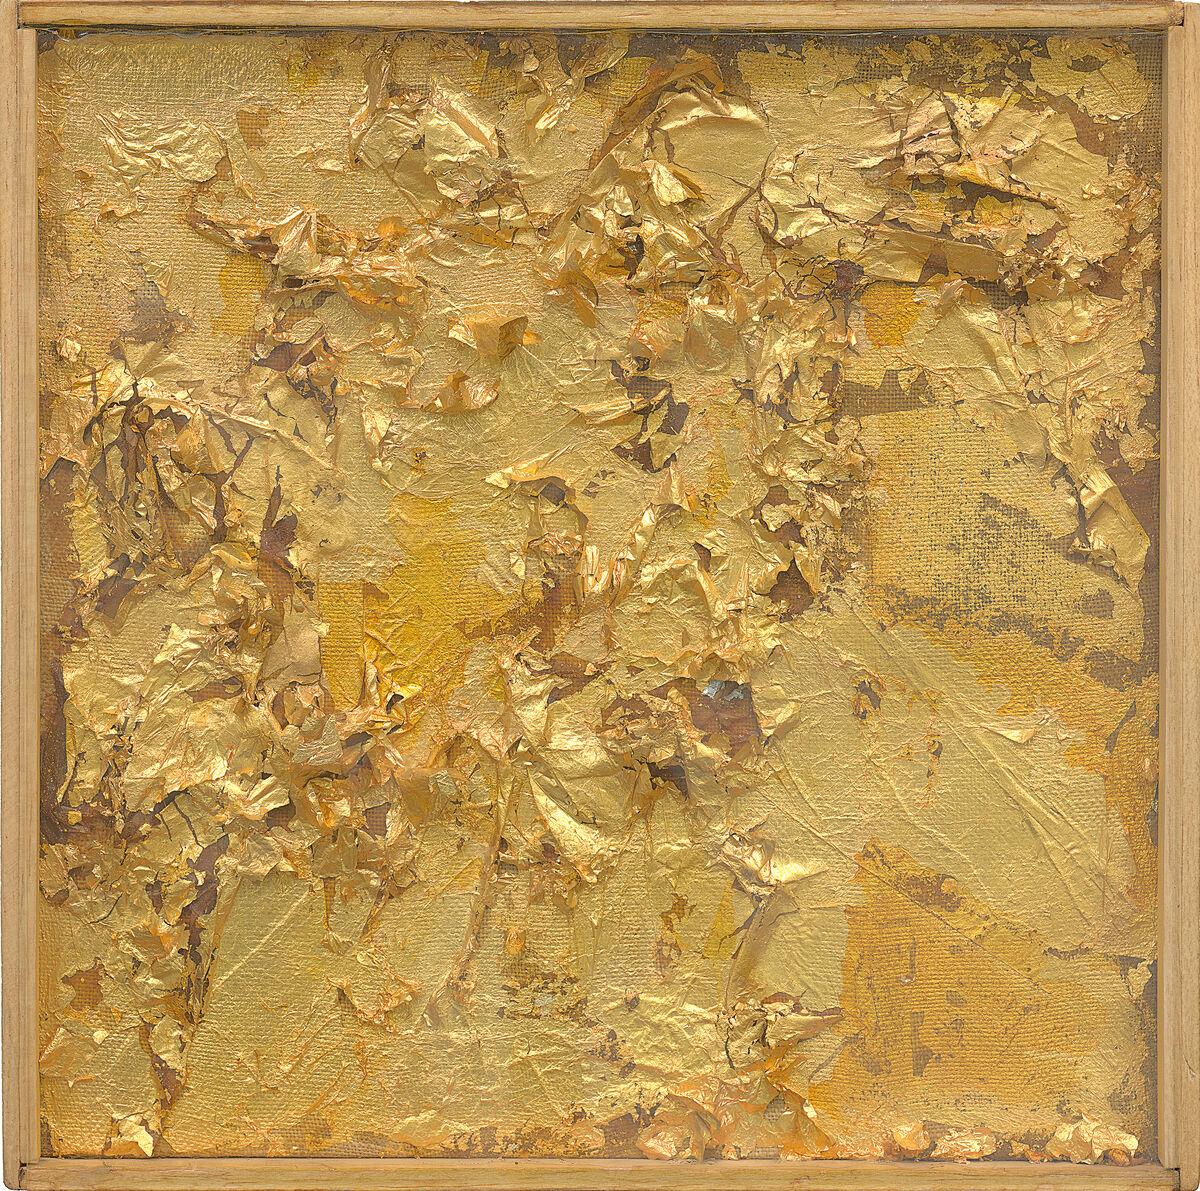 Robert Rauschenberg, Untitled (Gold Painting), ca. 1953. © 2017 Robert Rauschenberg Foundation. Courtesy of the Museum of Modern Art.